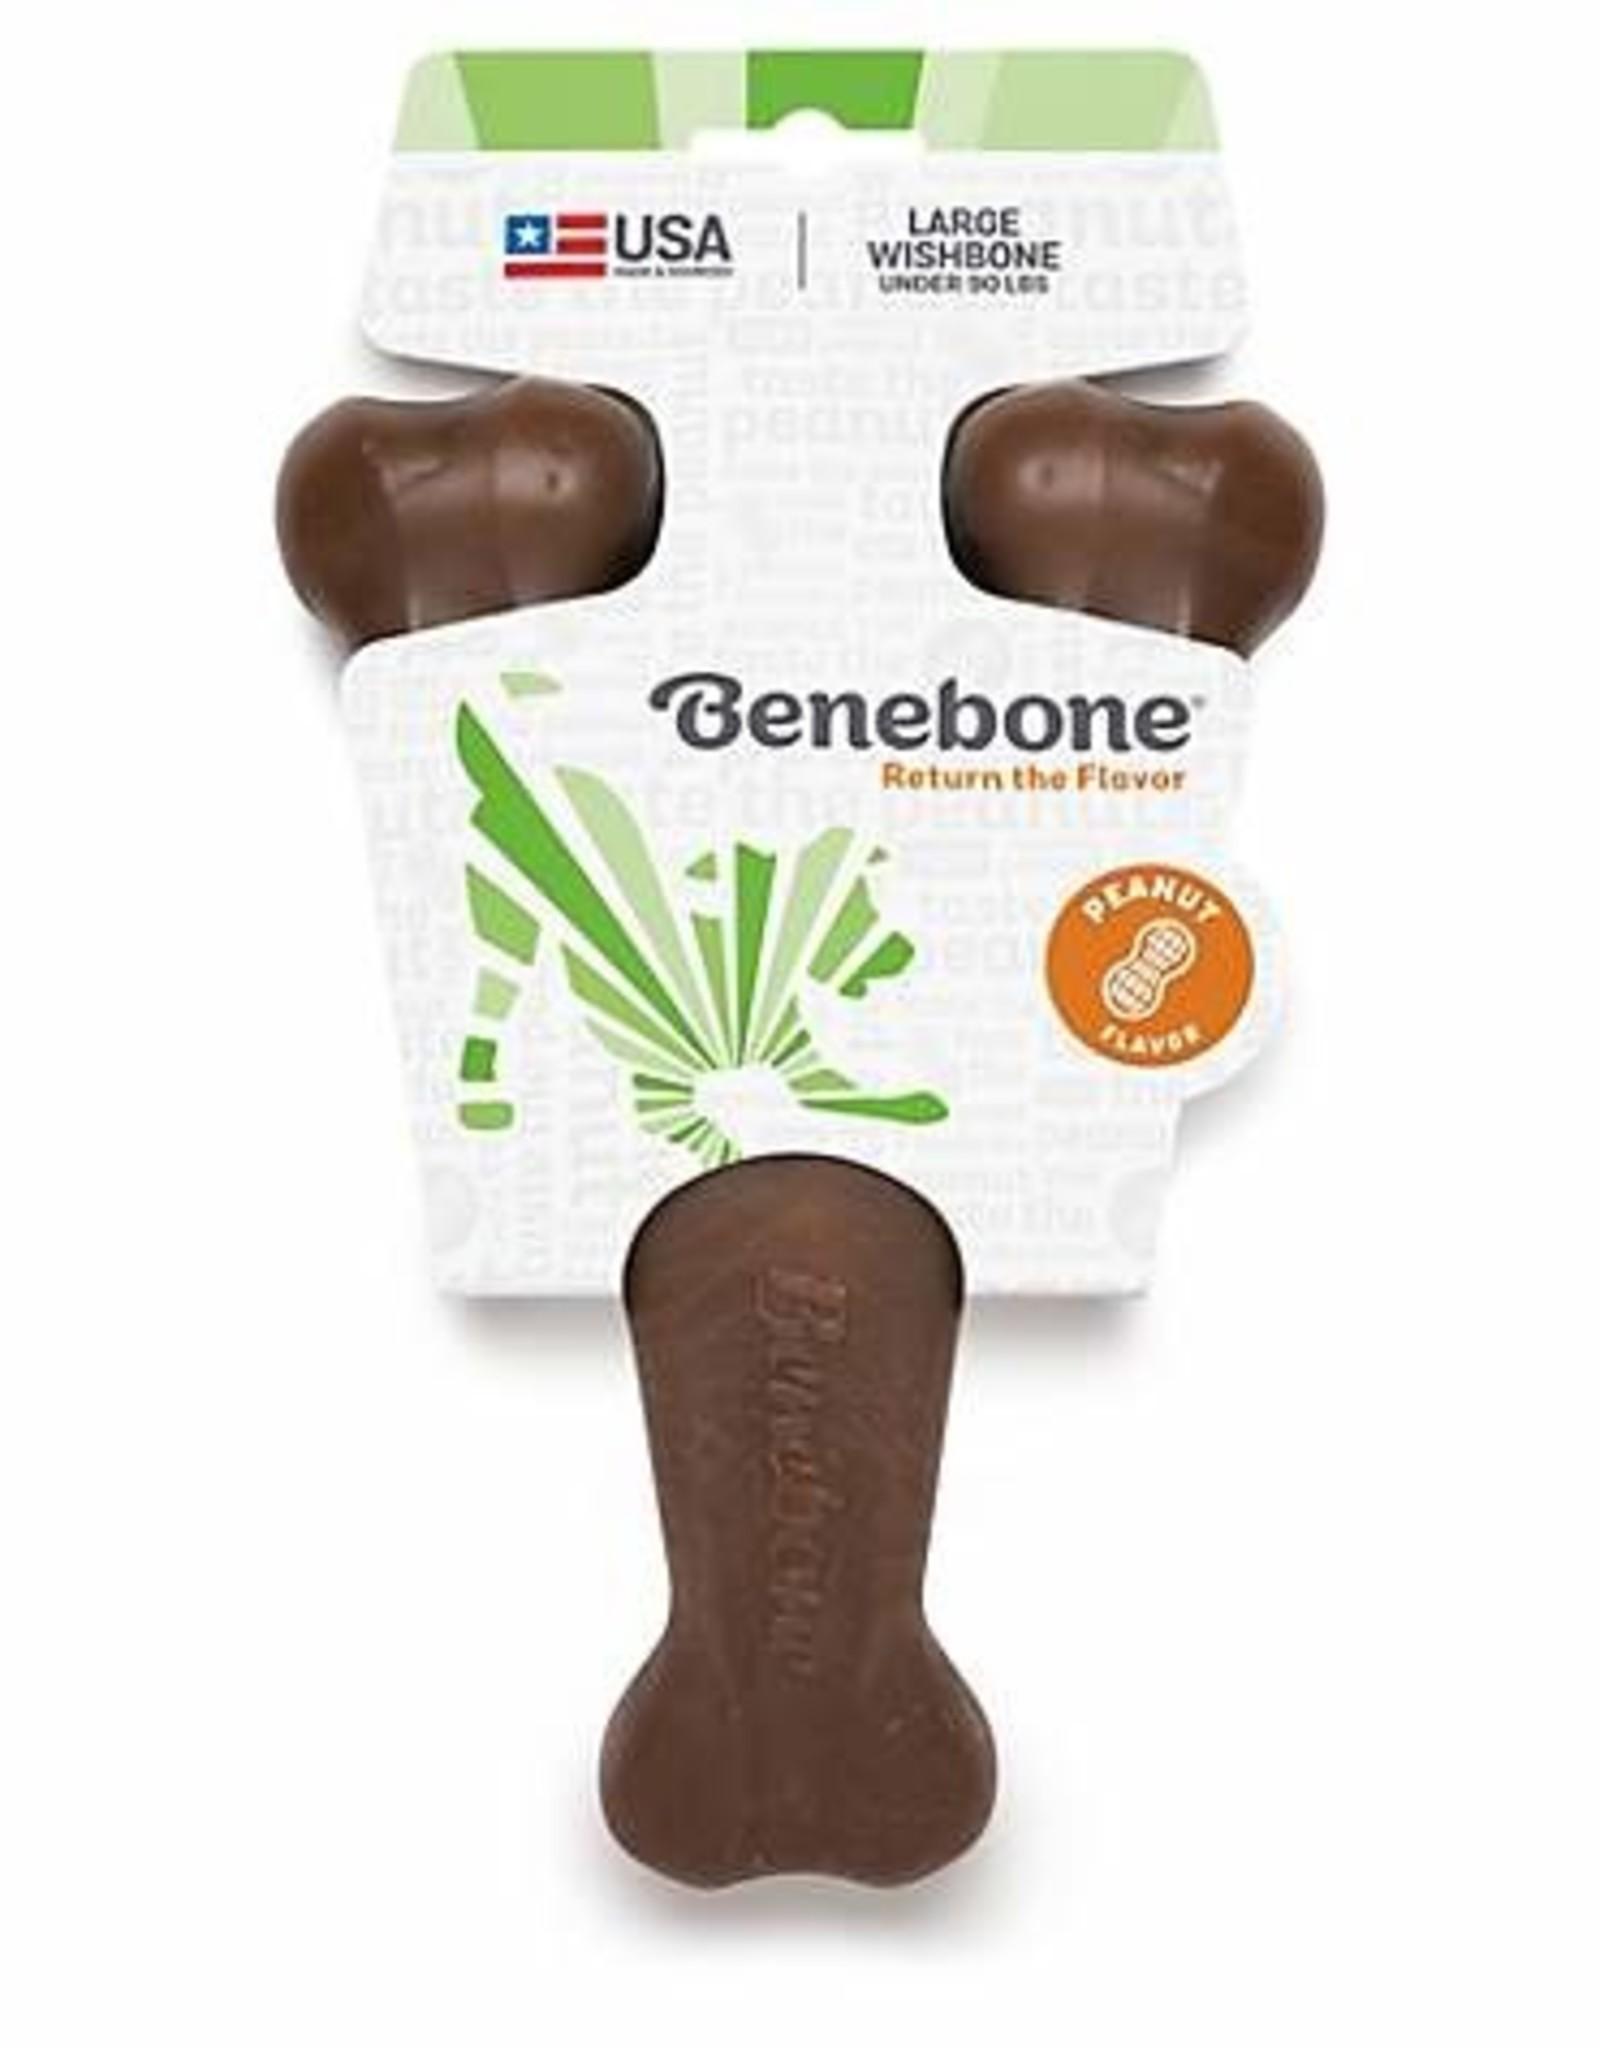 Benebone Benebone Wishbone